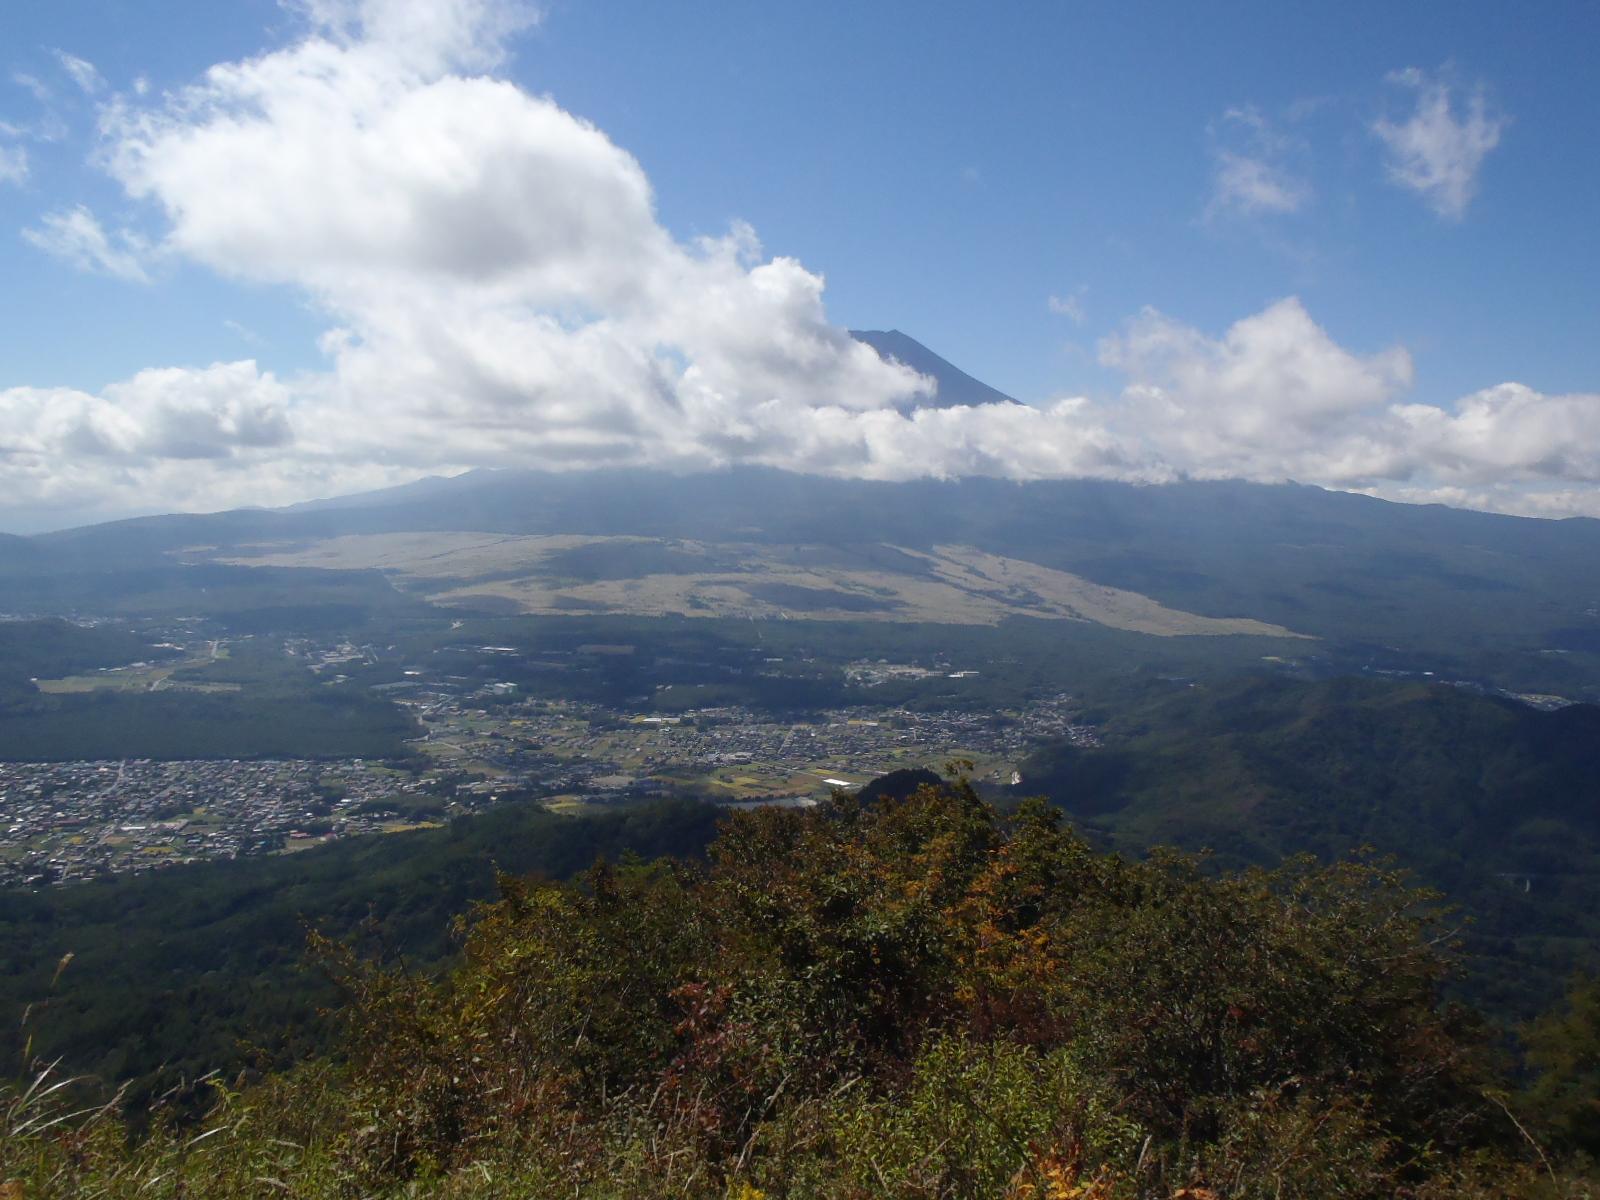 http://www.yamanashi-kankou.jp/blog/p5Y3rV_25.jpg